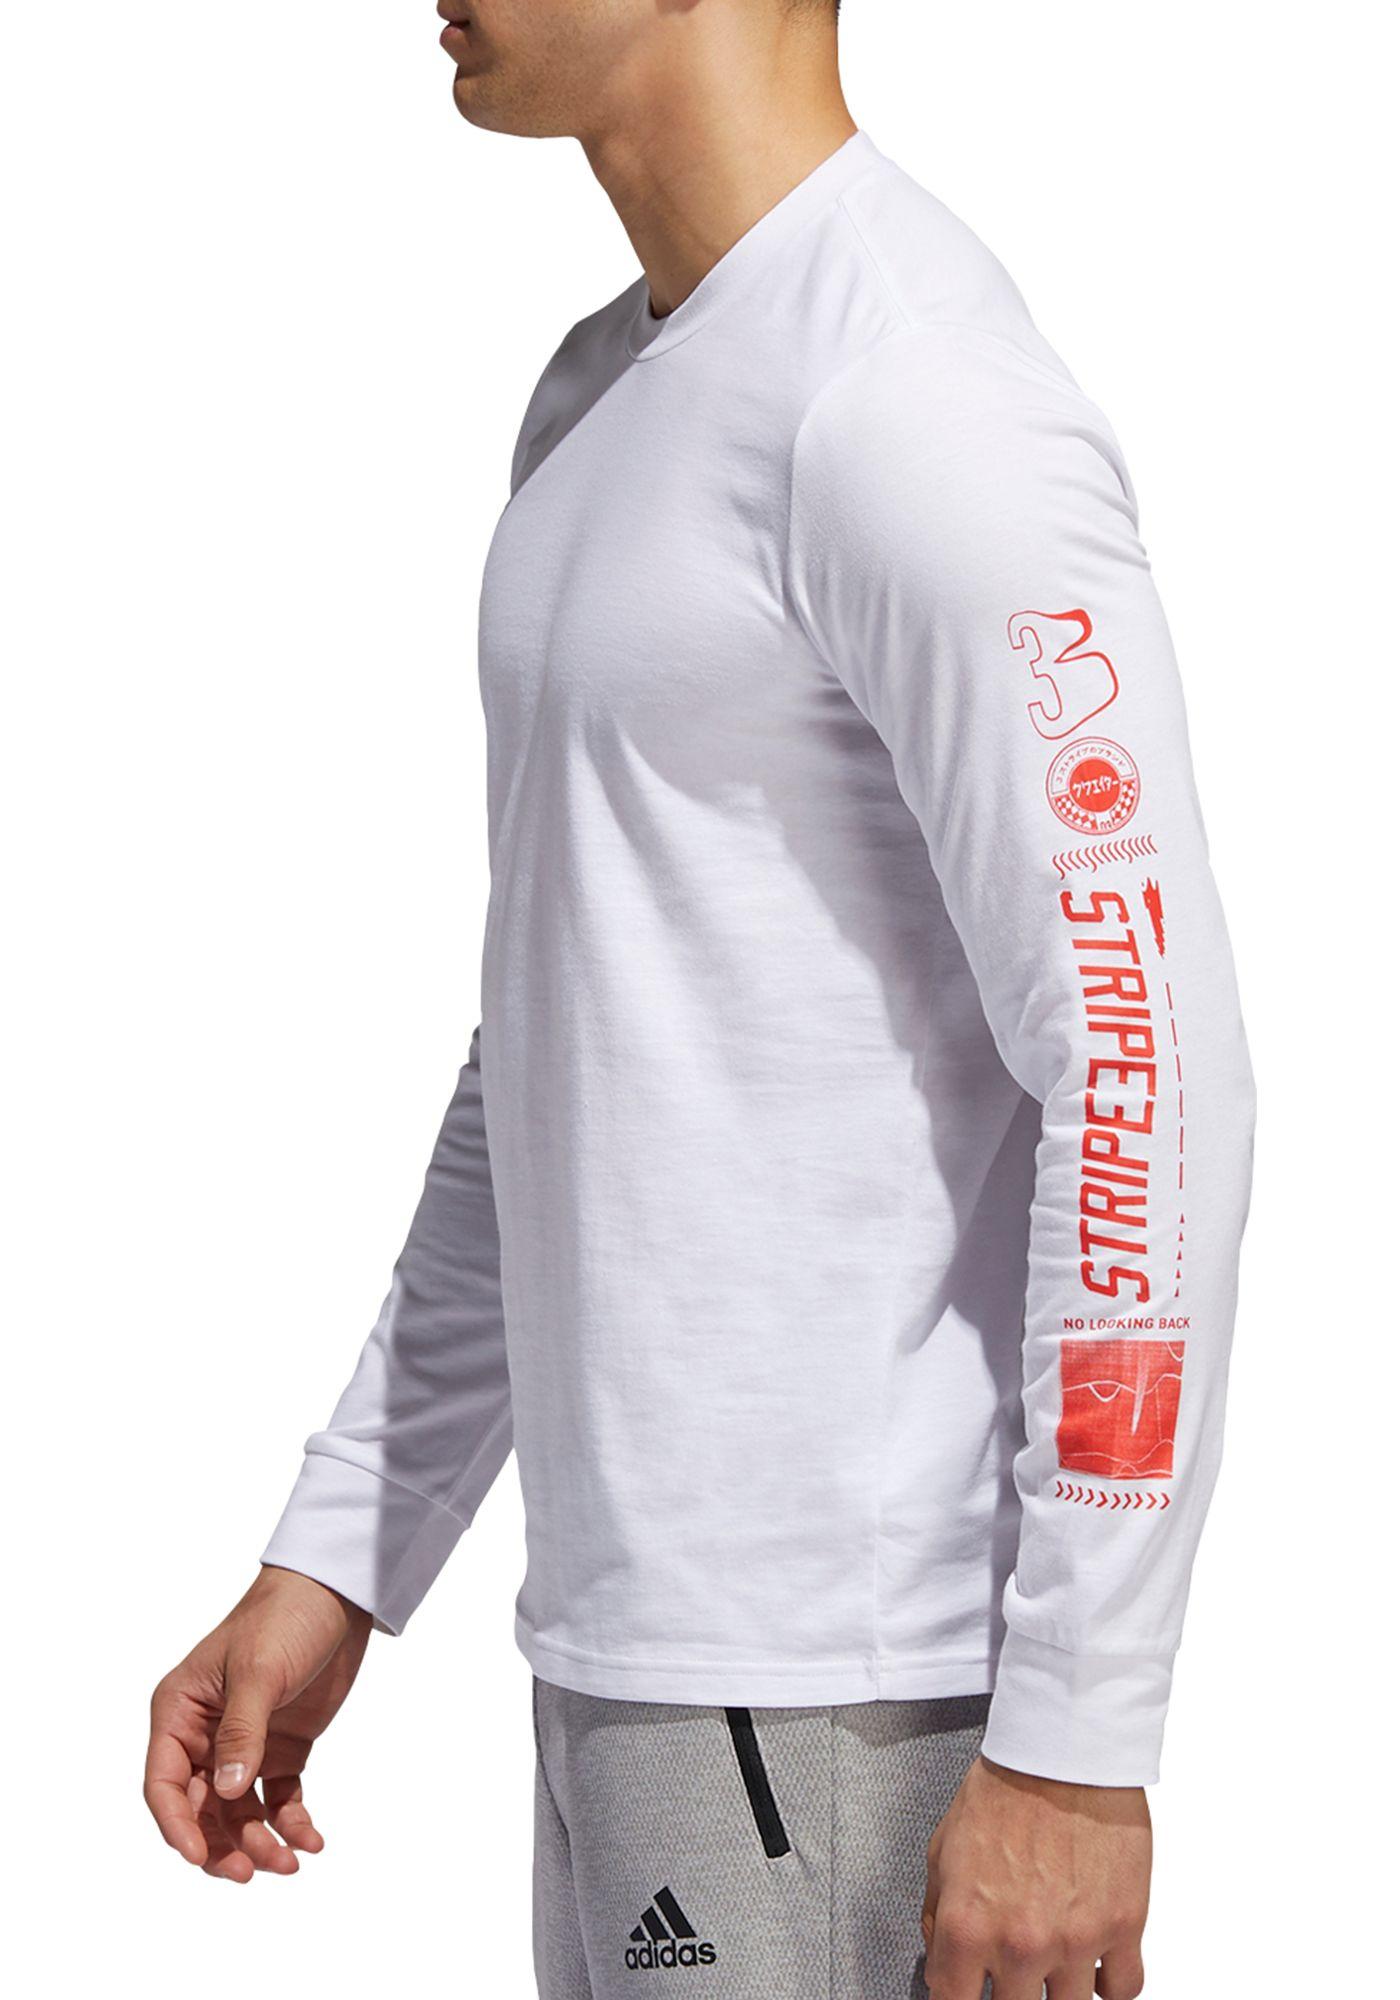 adidas Men's Athletics Hypersport Amplifier Long Sleeve Shirt